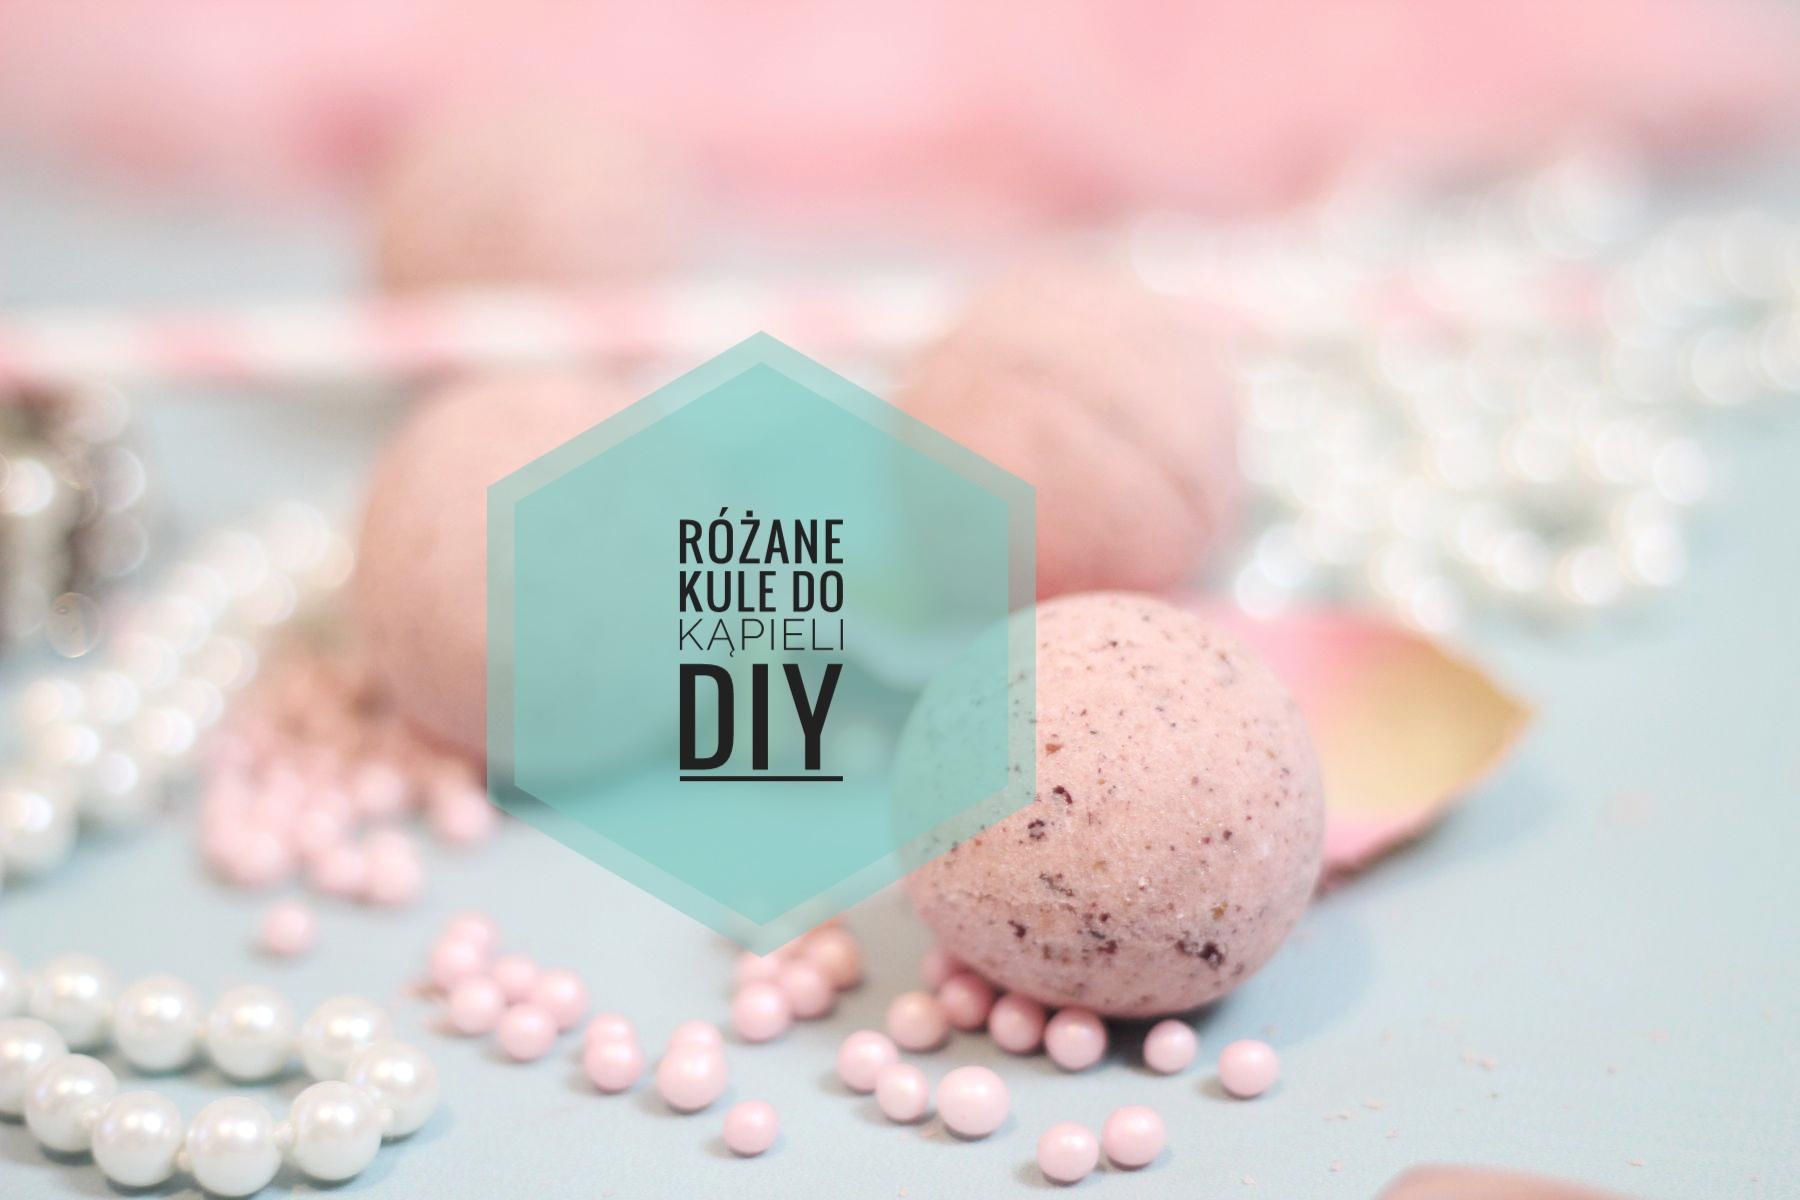 Różane kule kąpielowe DIY